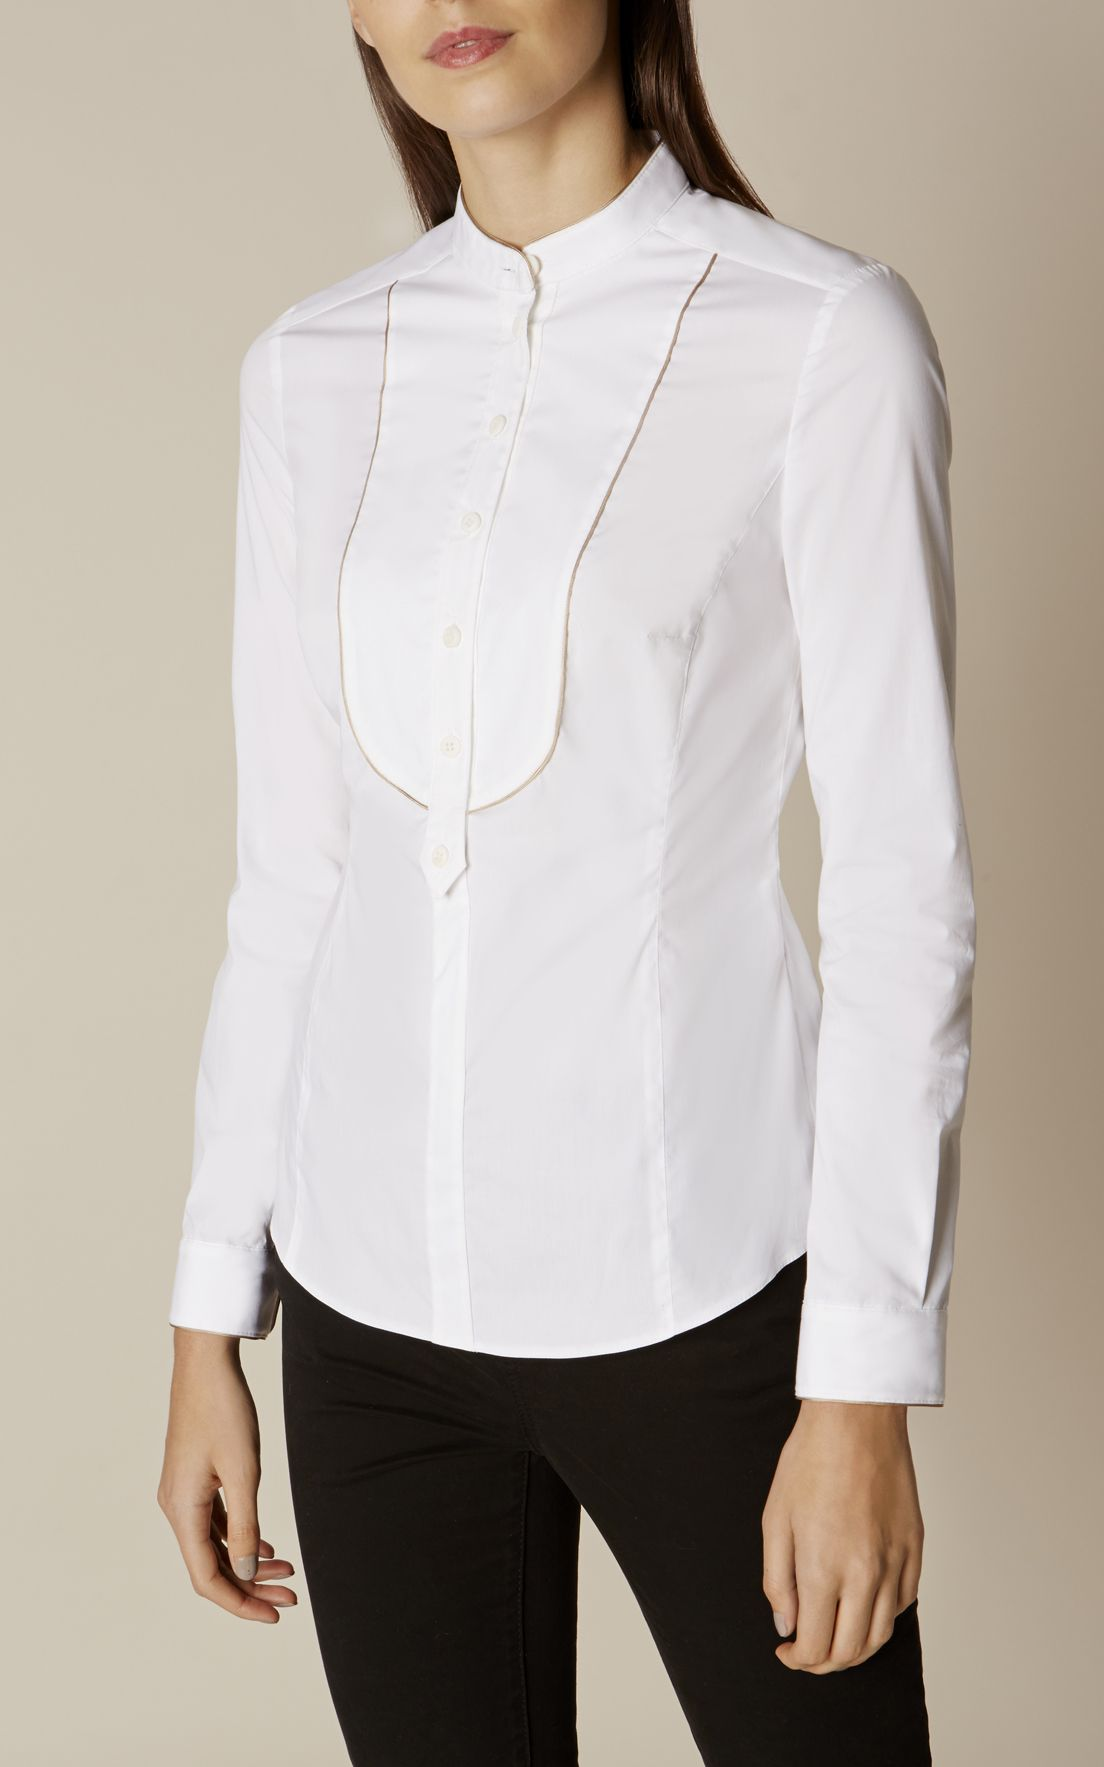 73b3156030e Karen Millen, BIB- FRONT SHIRT White | Things to Sew. Shirts & Pants ...